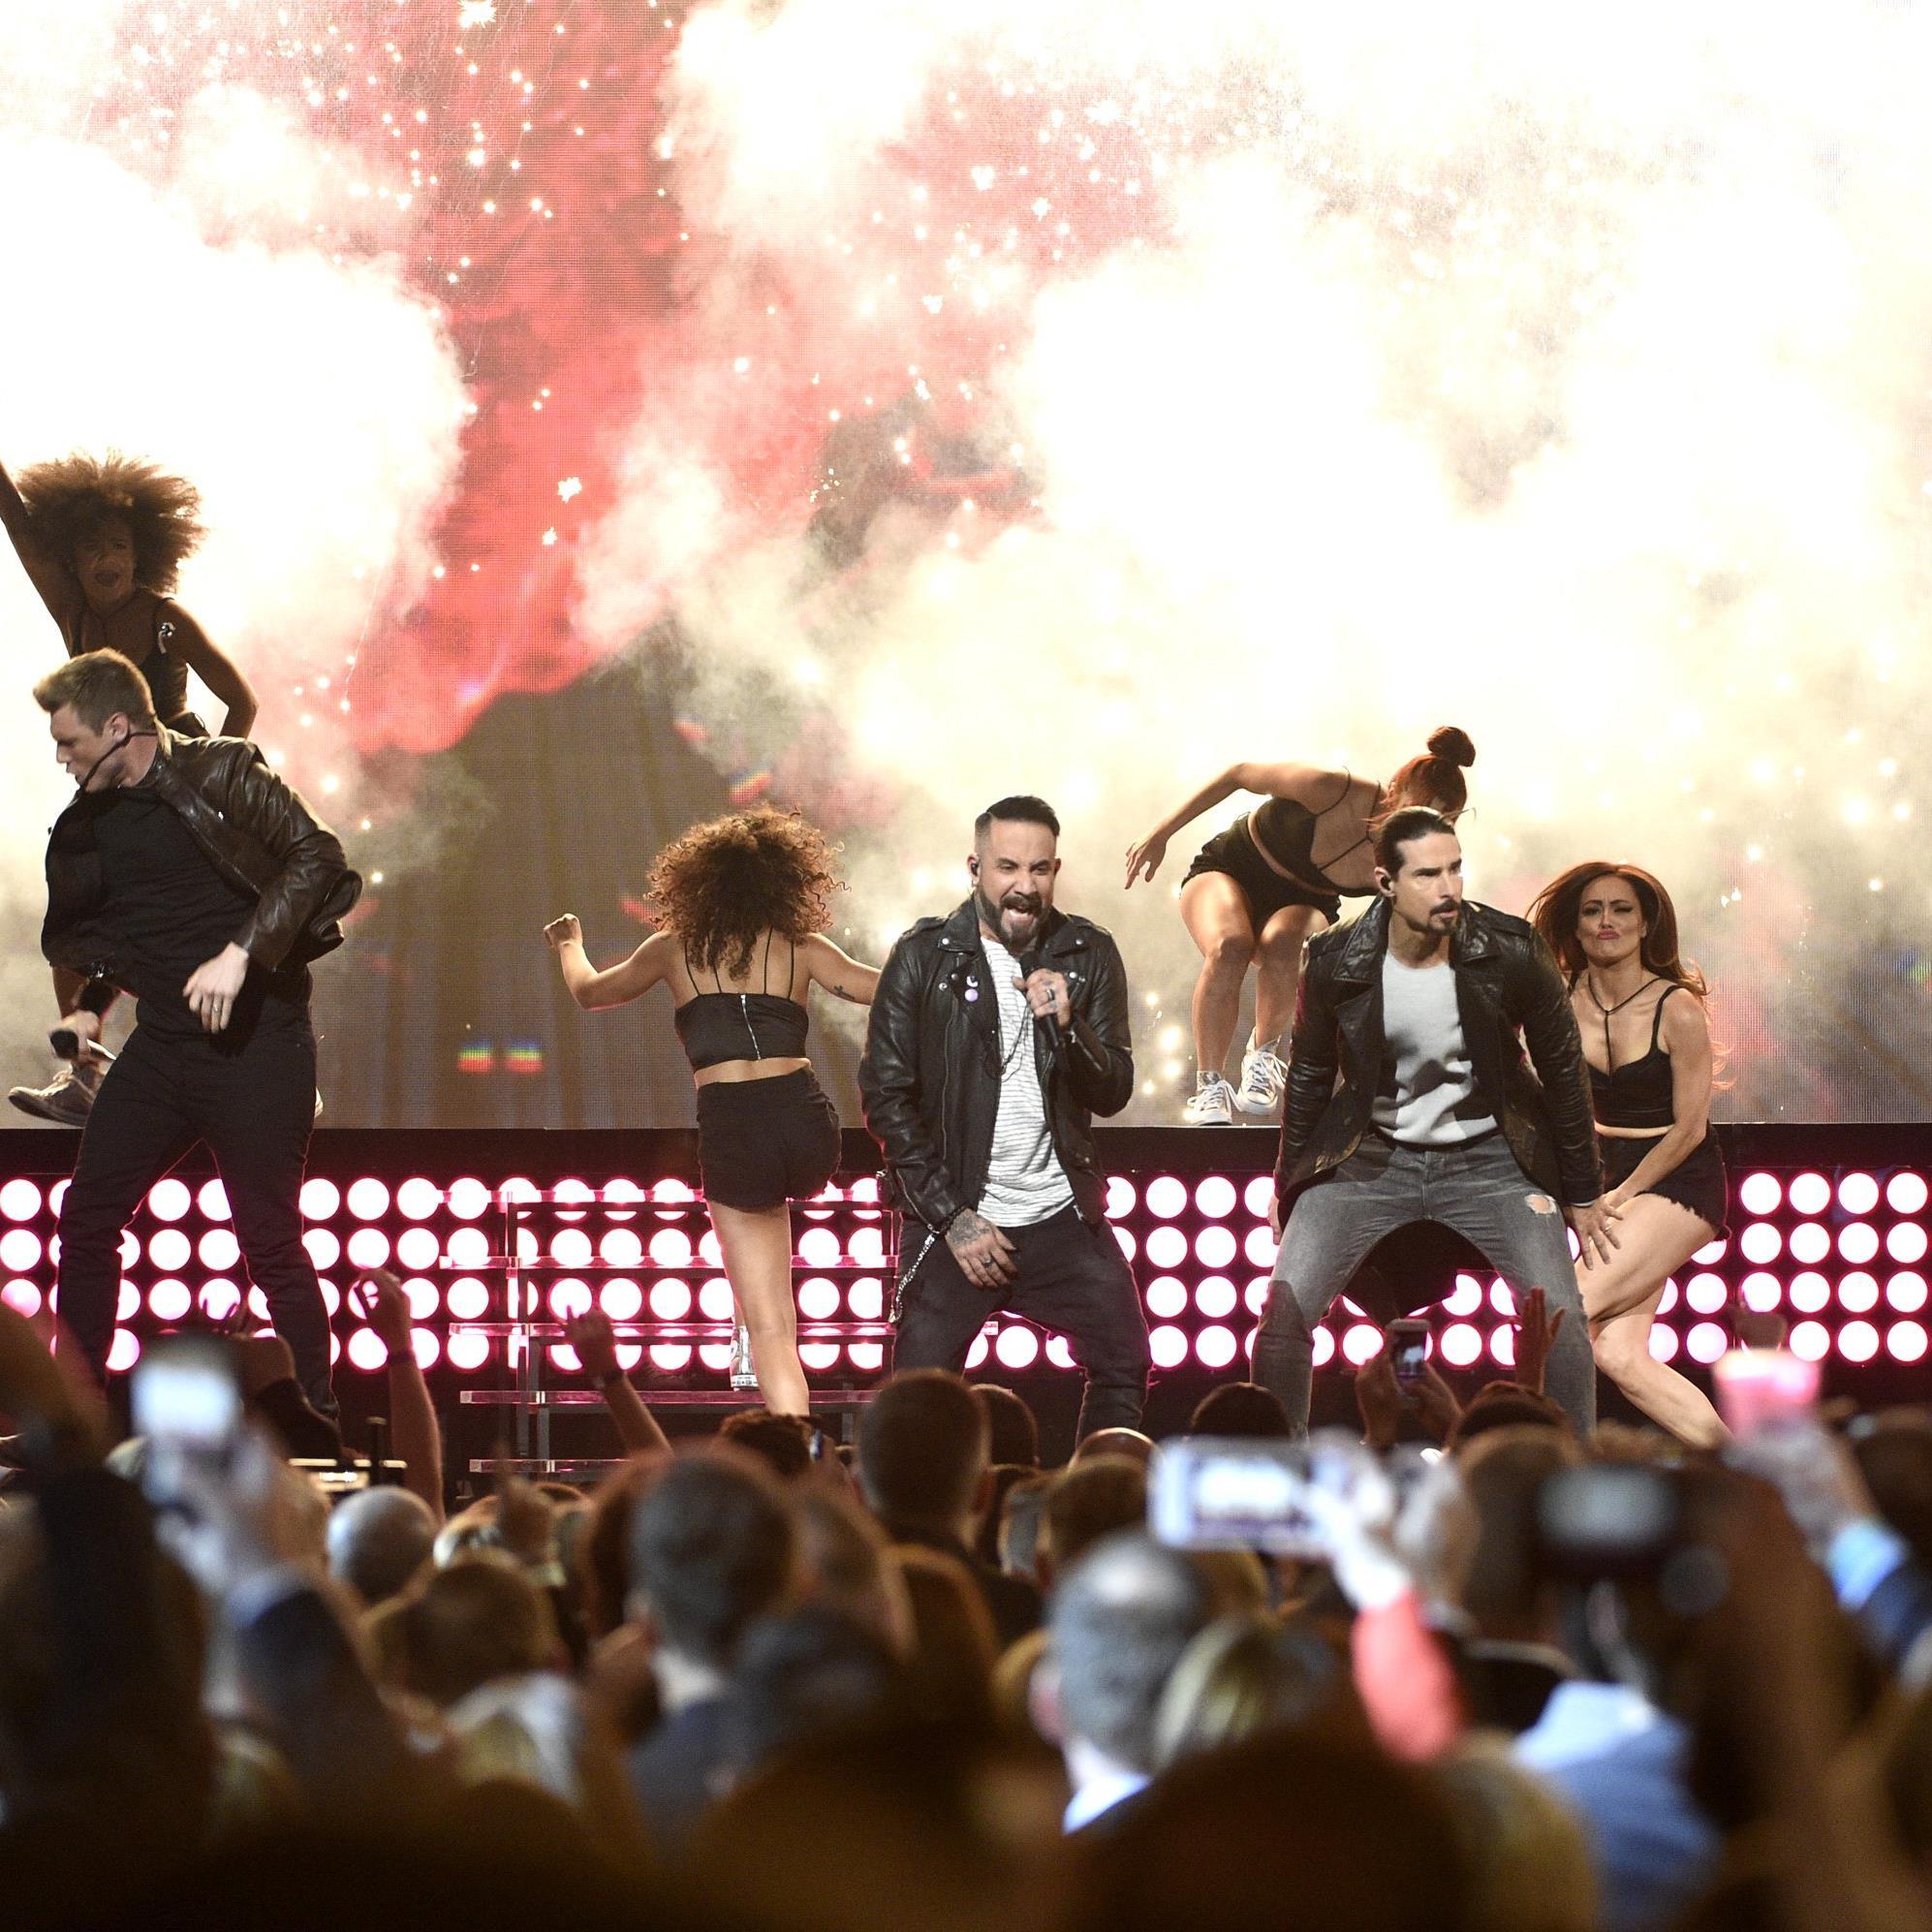 Die Backstreet Boys waren das Highligt der ACM Awards